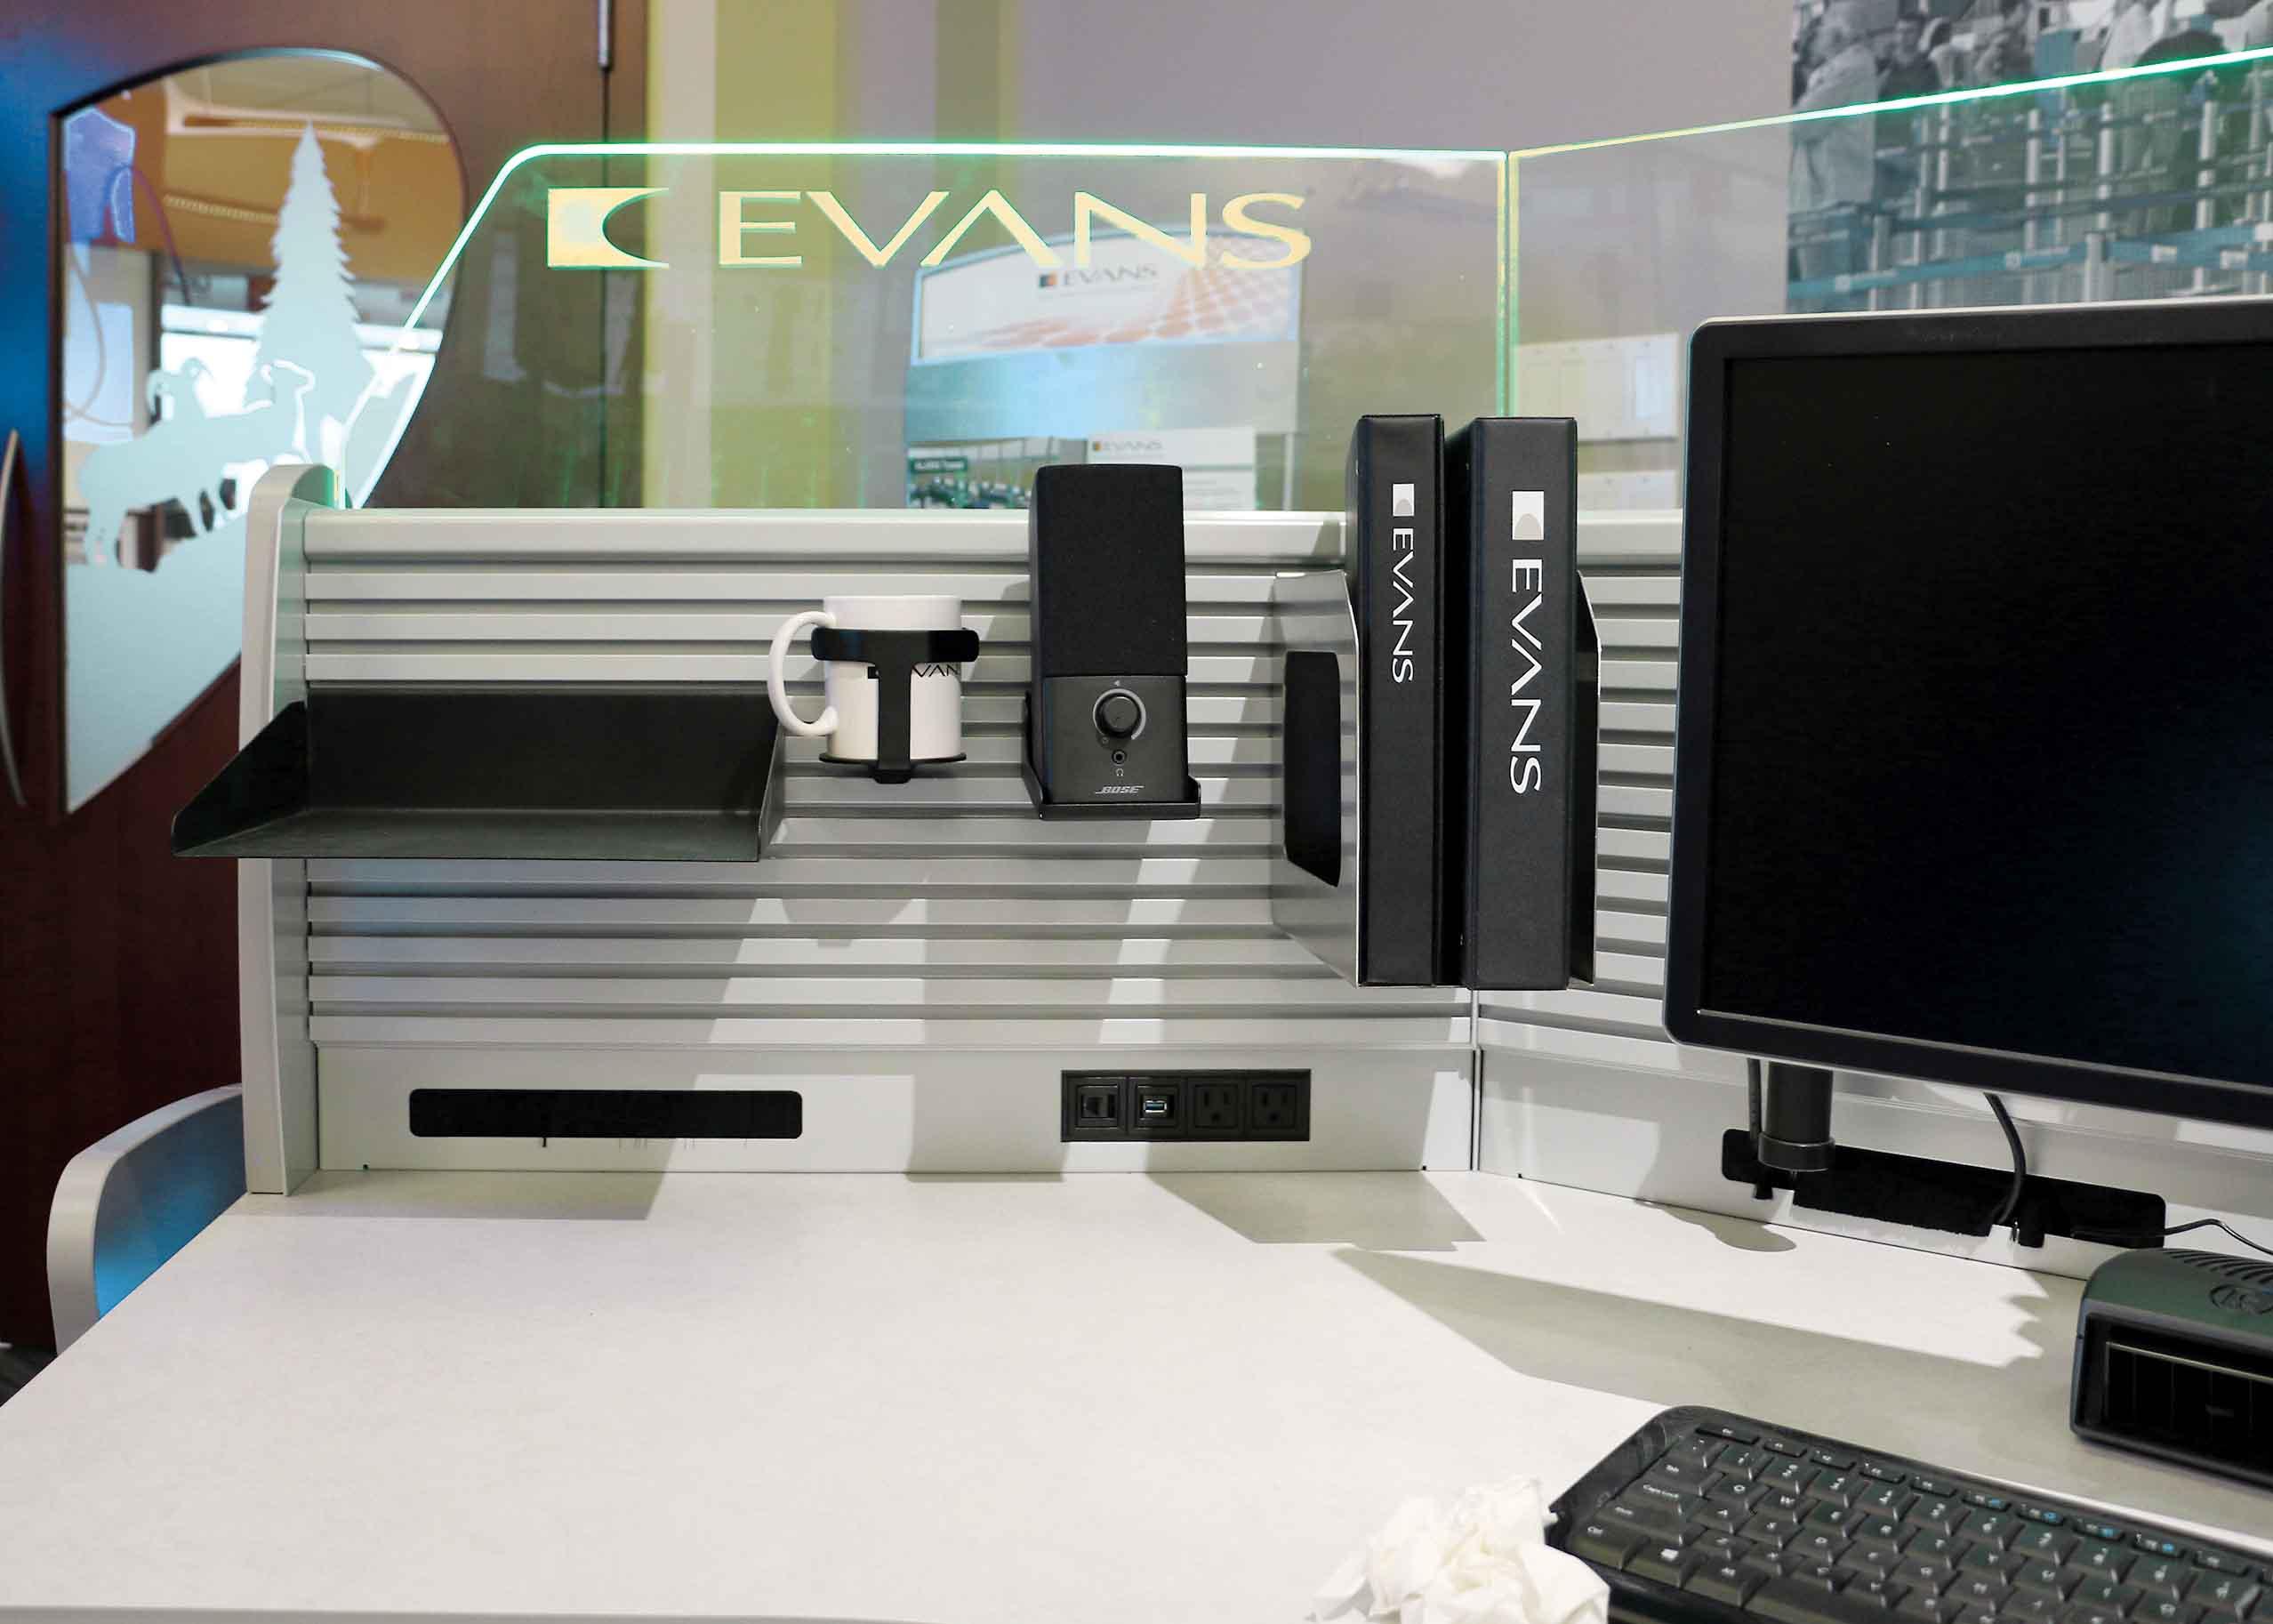 showroom-accessories-evans-slatwall-binder-cupholder